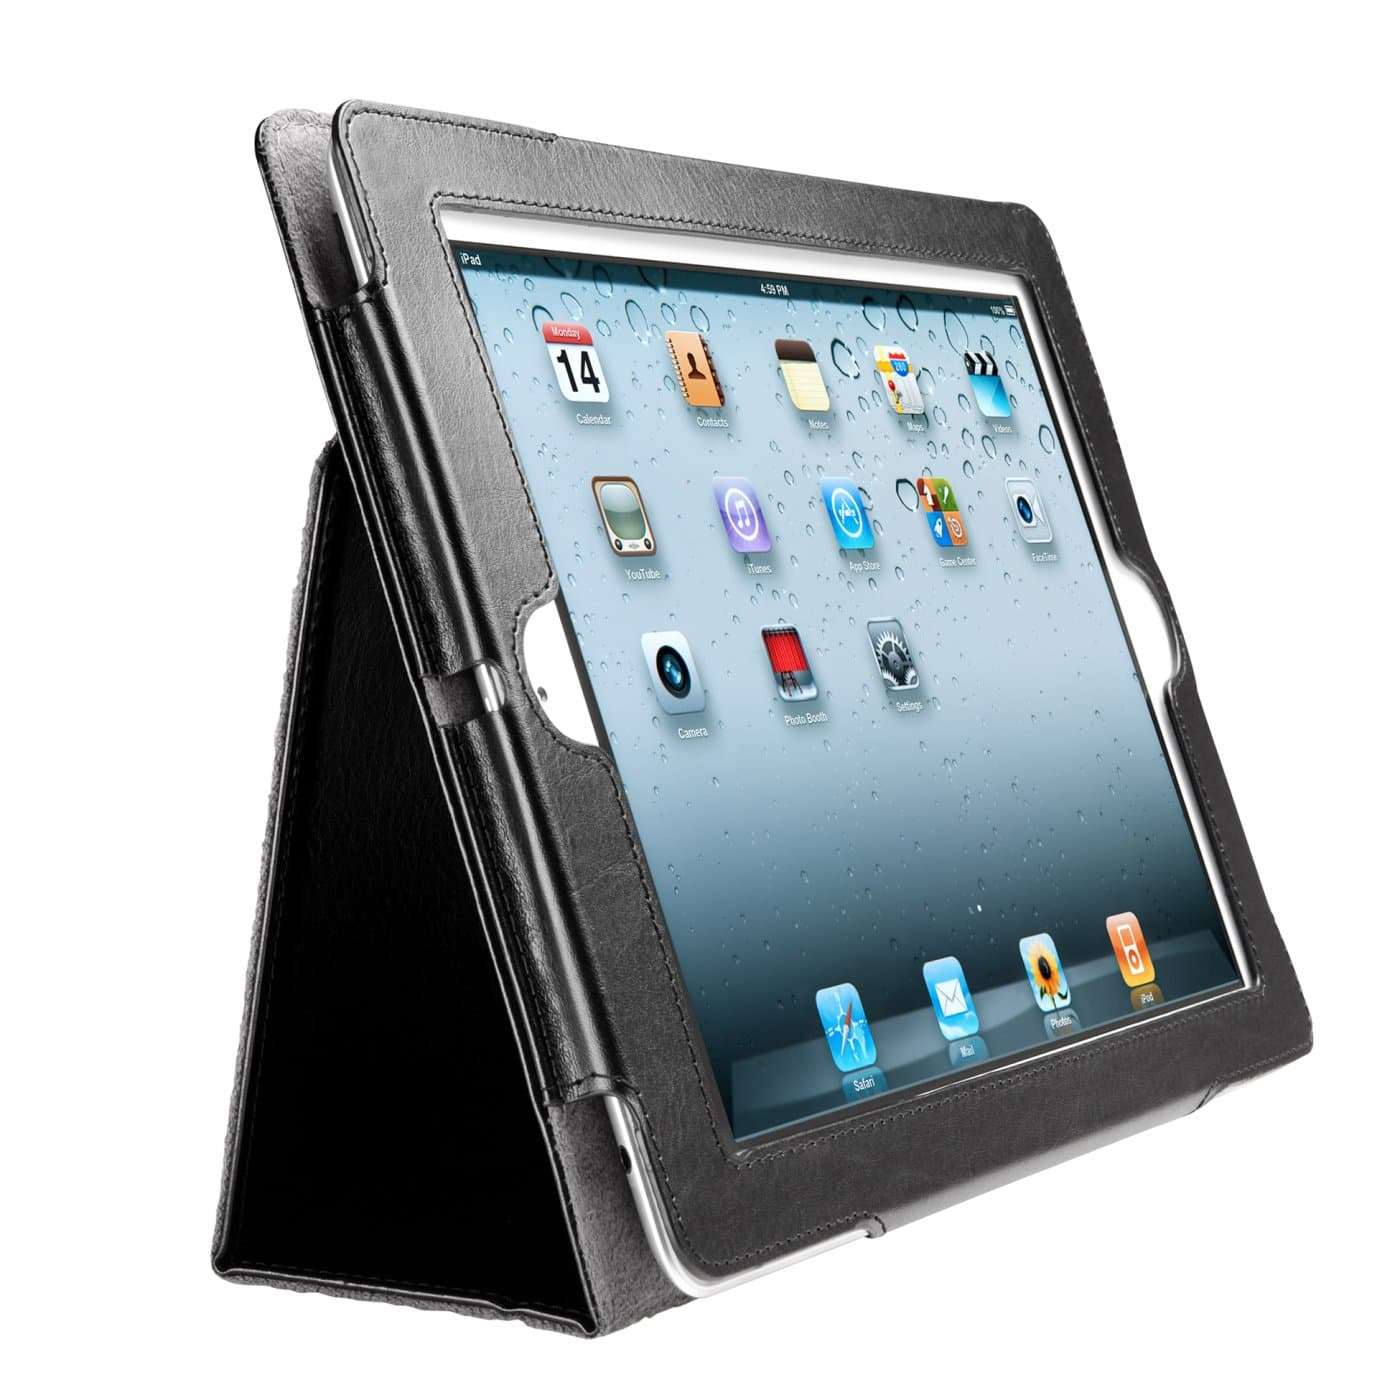 Kensington Products Tablet Smartphone Accessories Folios Cases Folio Case For Ipad 4th Gen 3rd Gen Ipad 2 Black